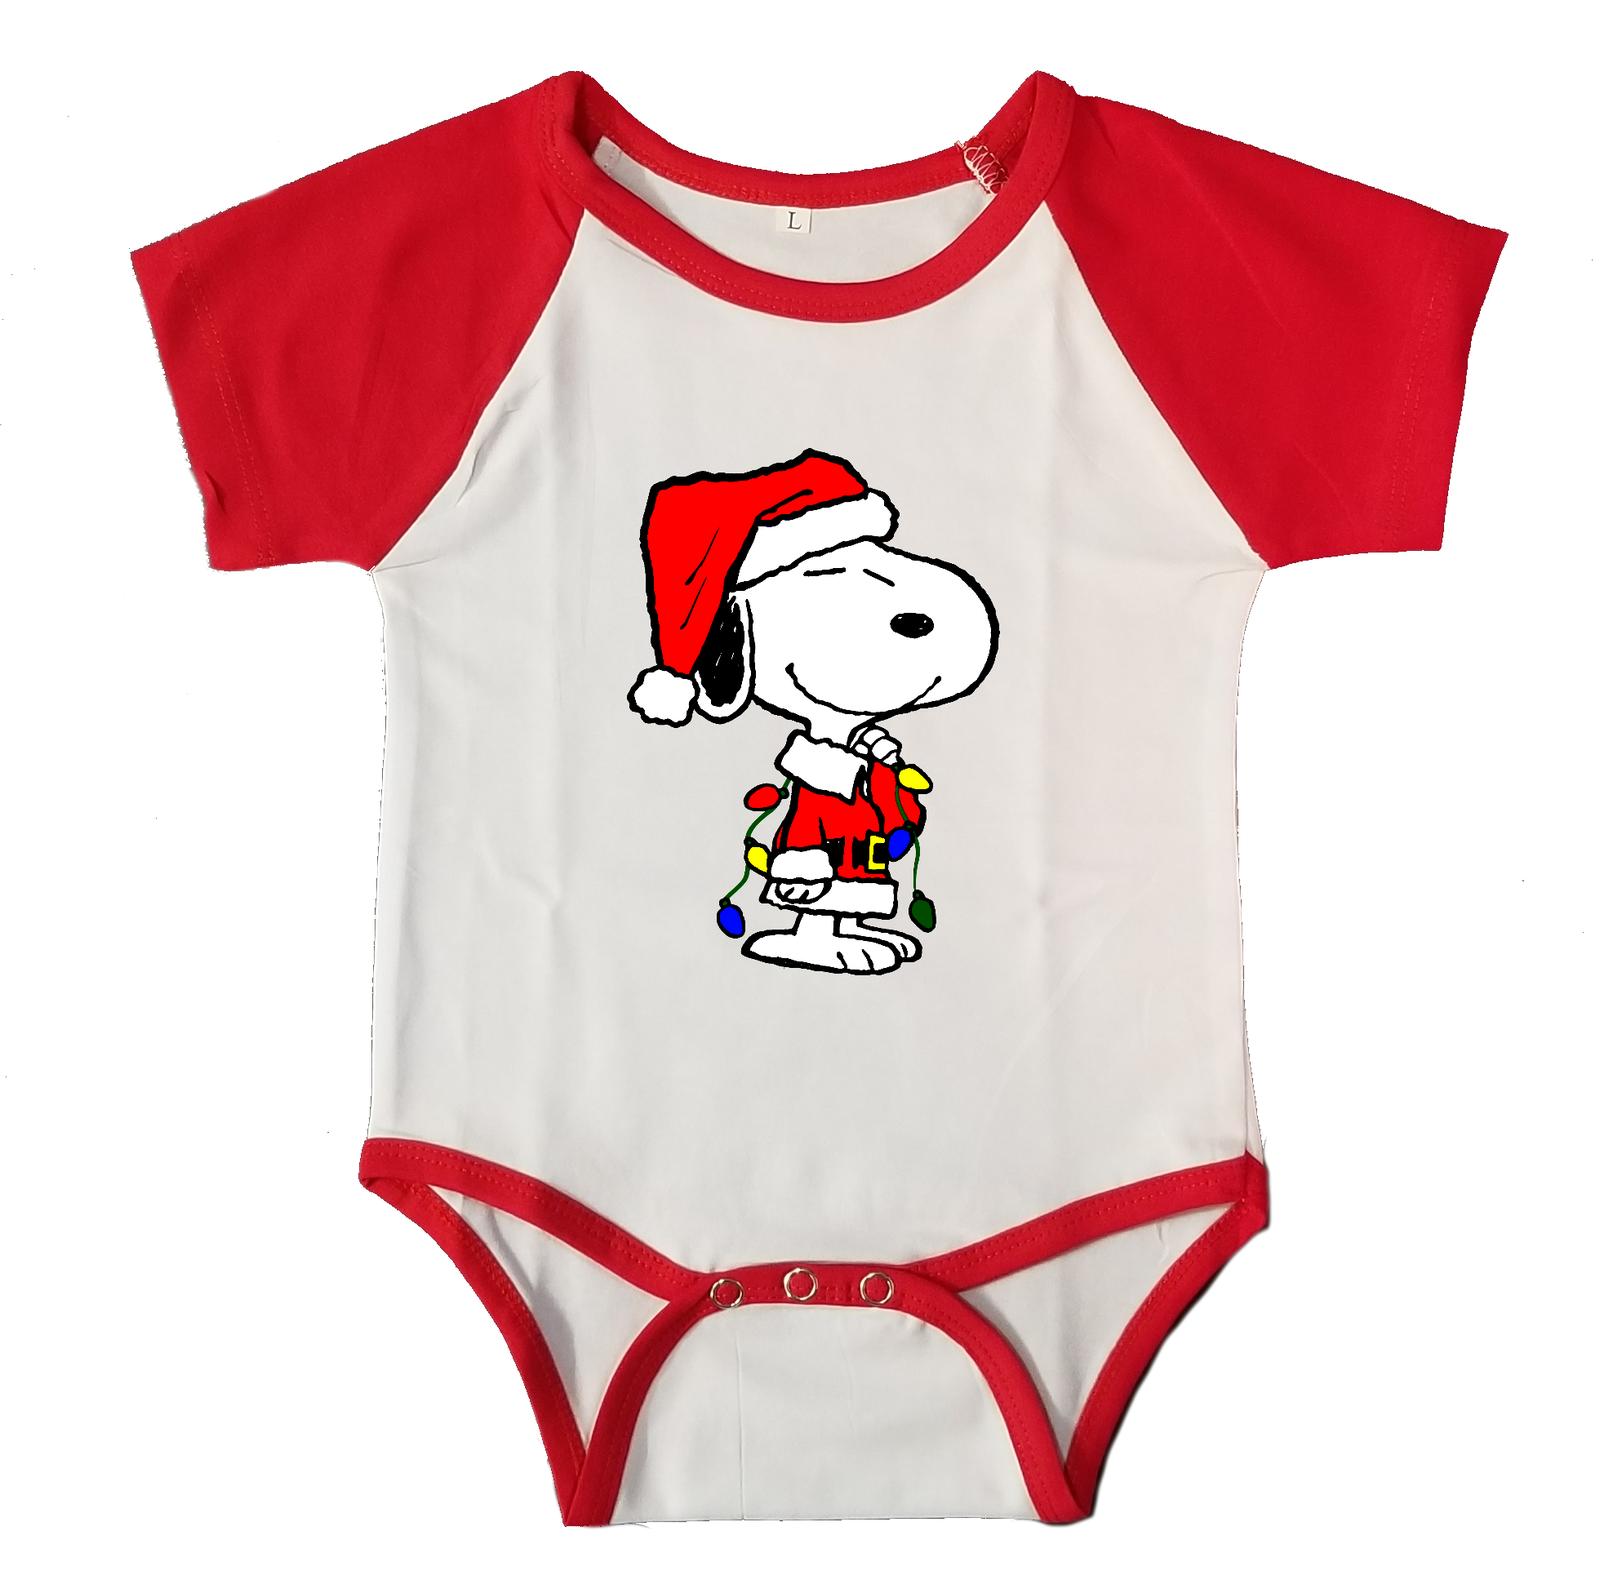 Philadelphia Eagles Jersey Baby Shirt Bodysuit Love Watching with Grandpa